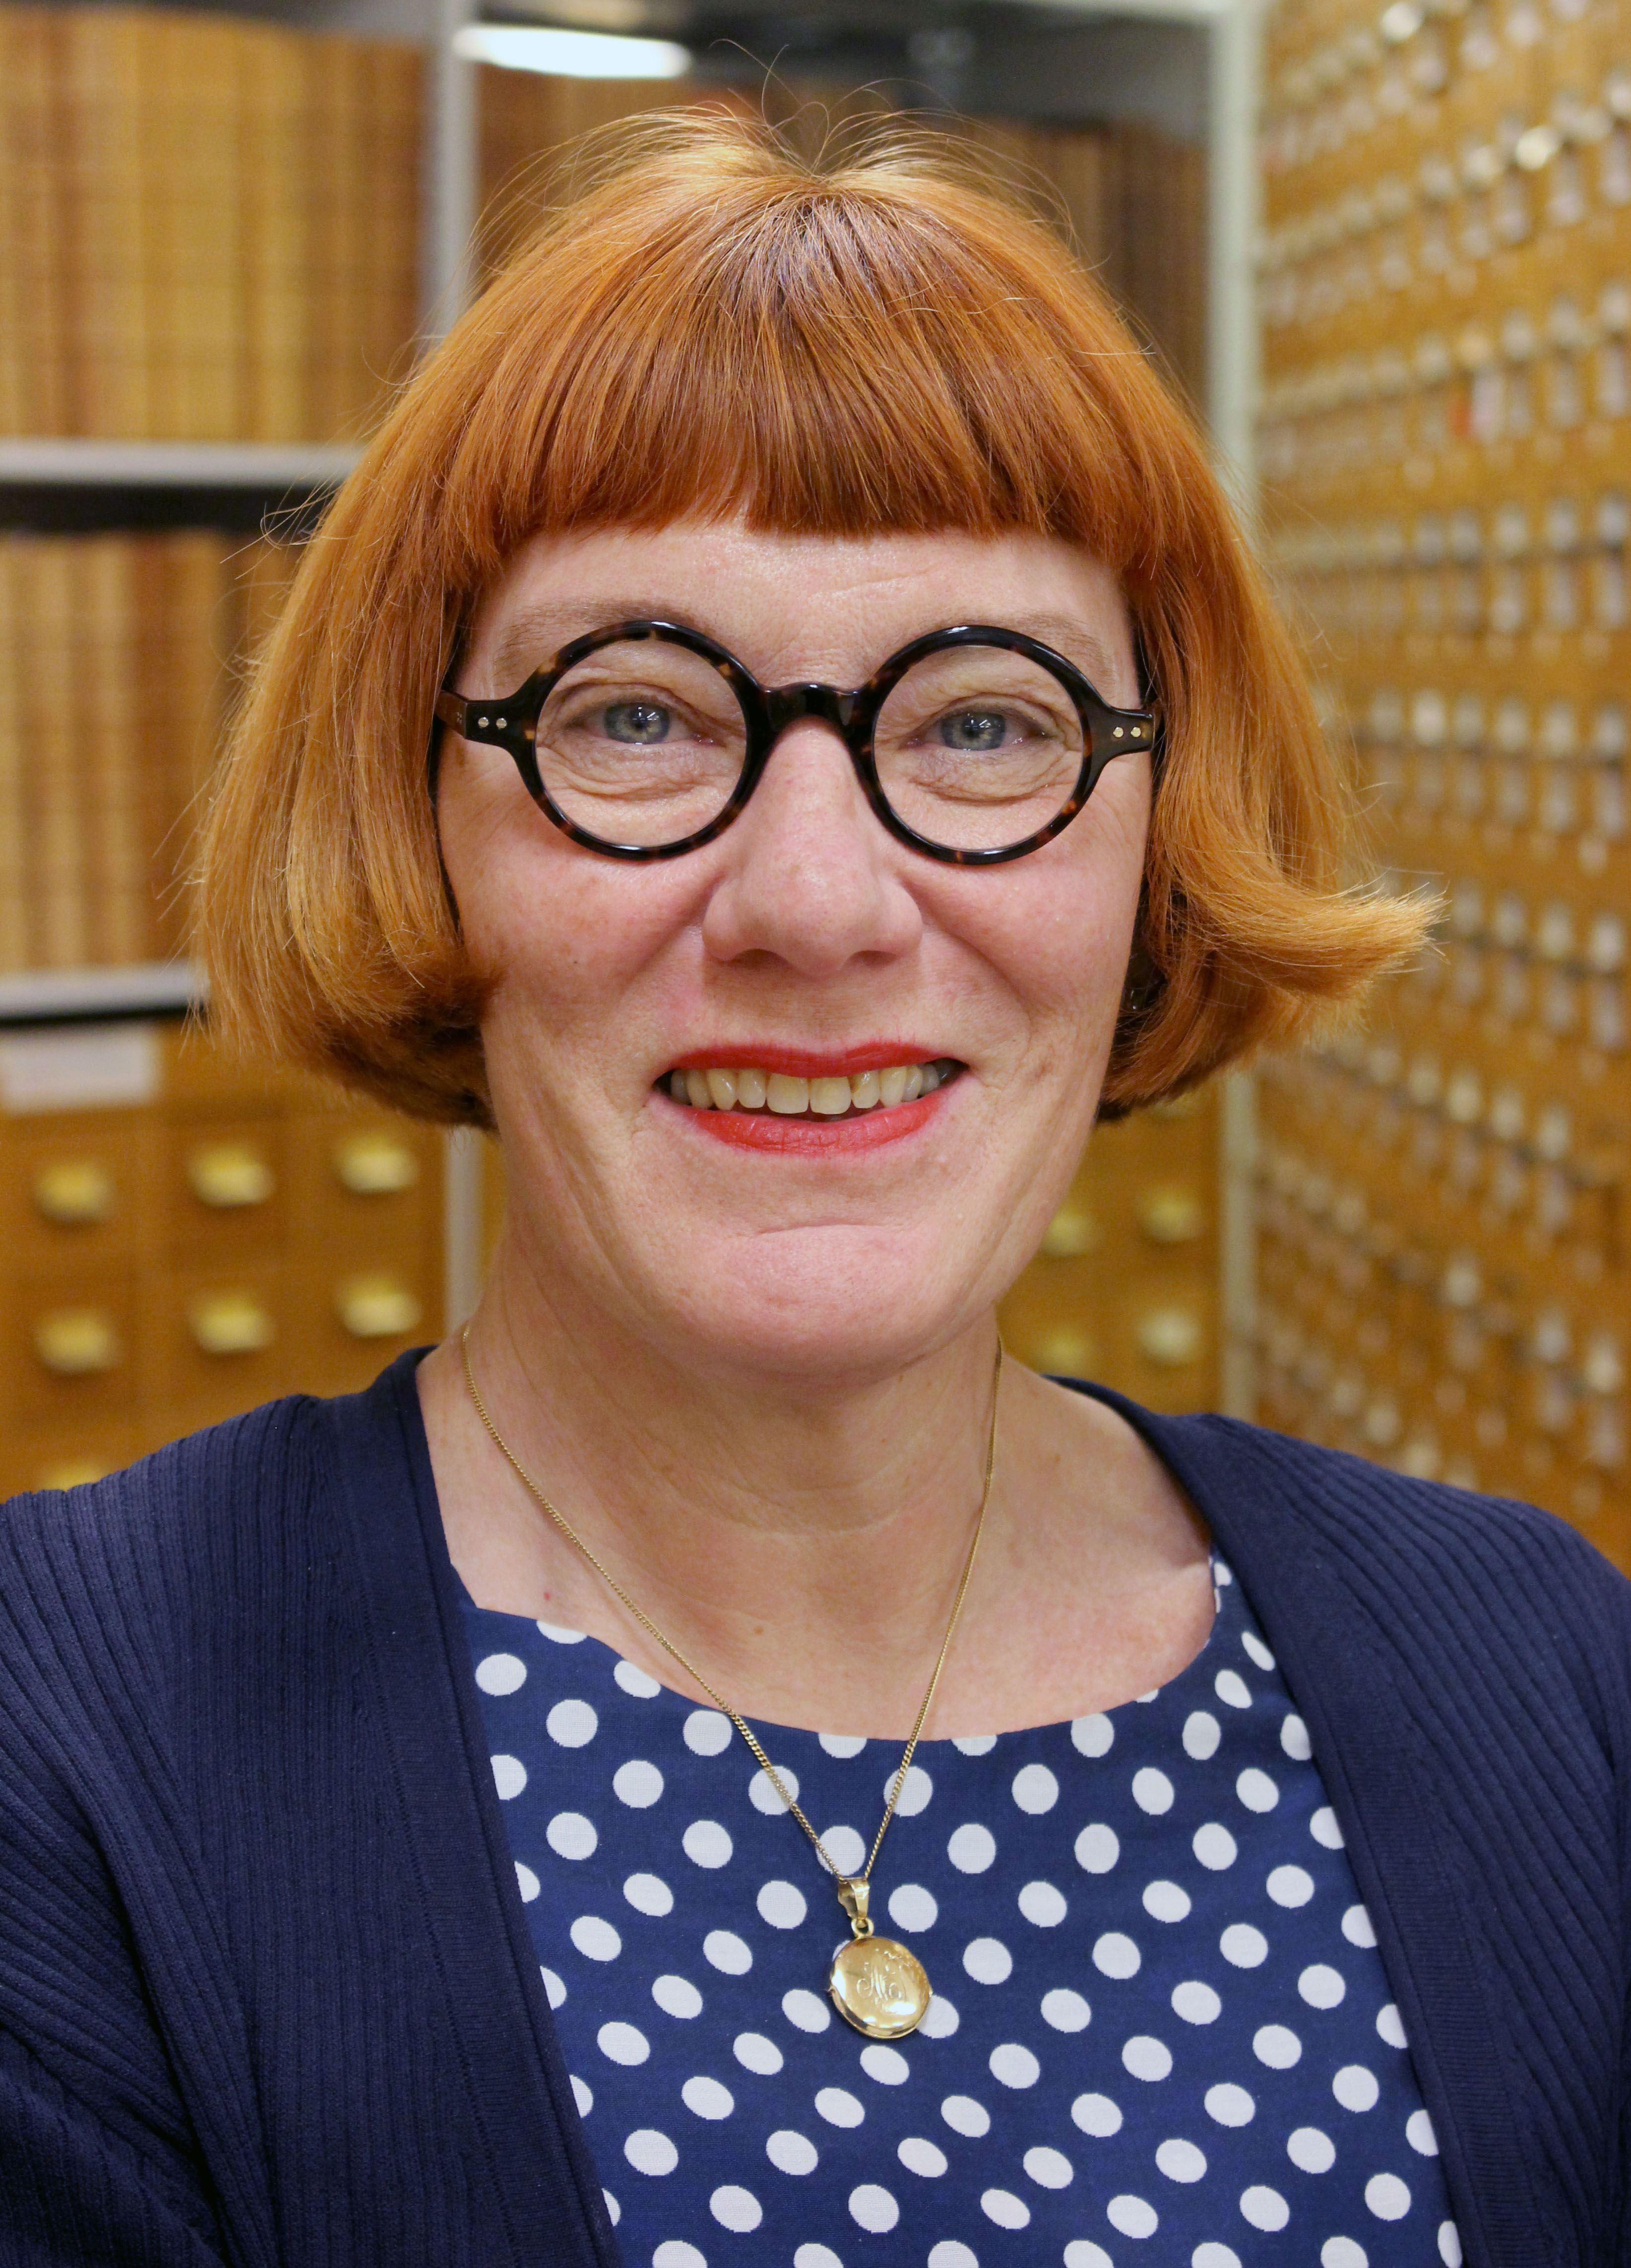 Linn Kierkegaard, 2019., Annette Torensjö